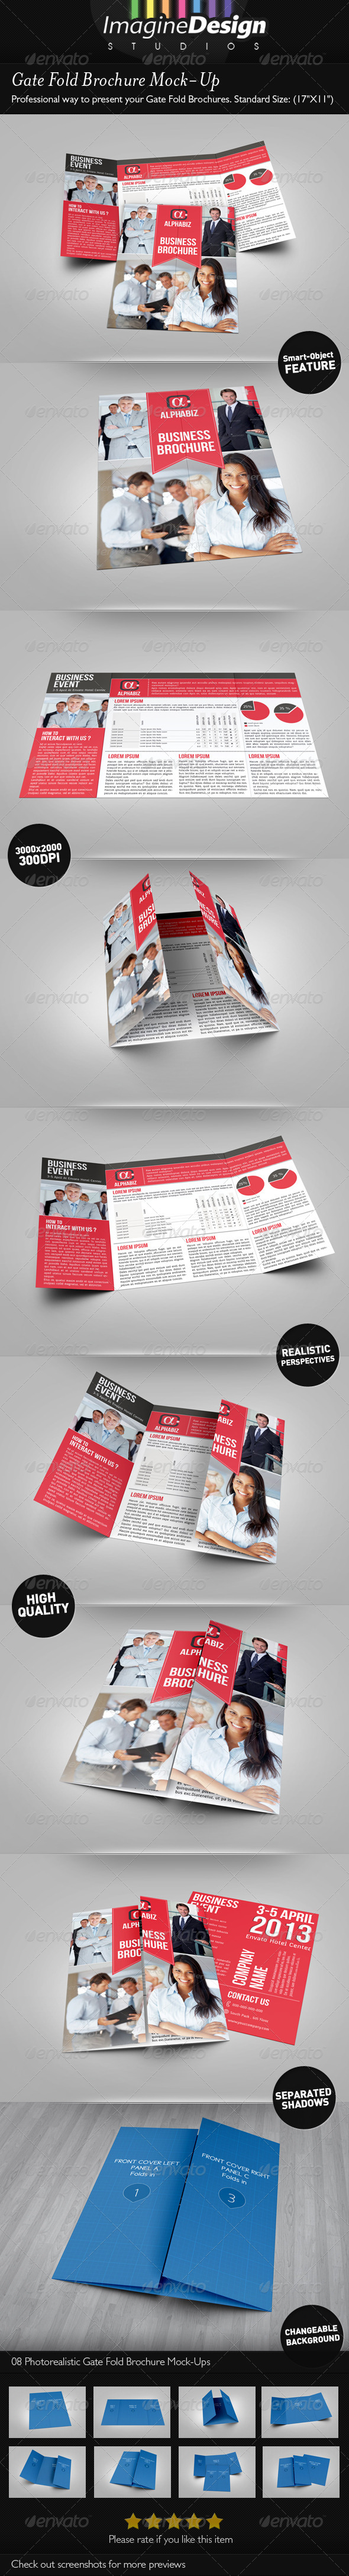 GraphicRiver Gate Fold Brochure Mock-Up 4065652